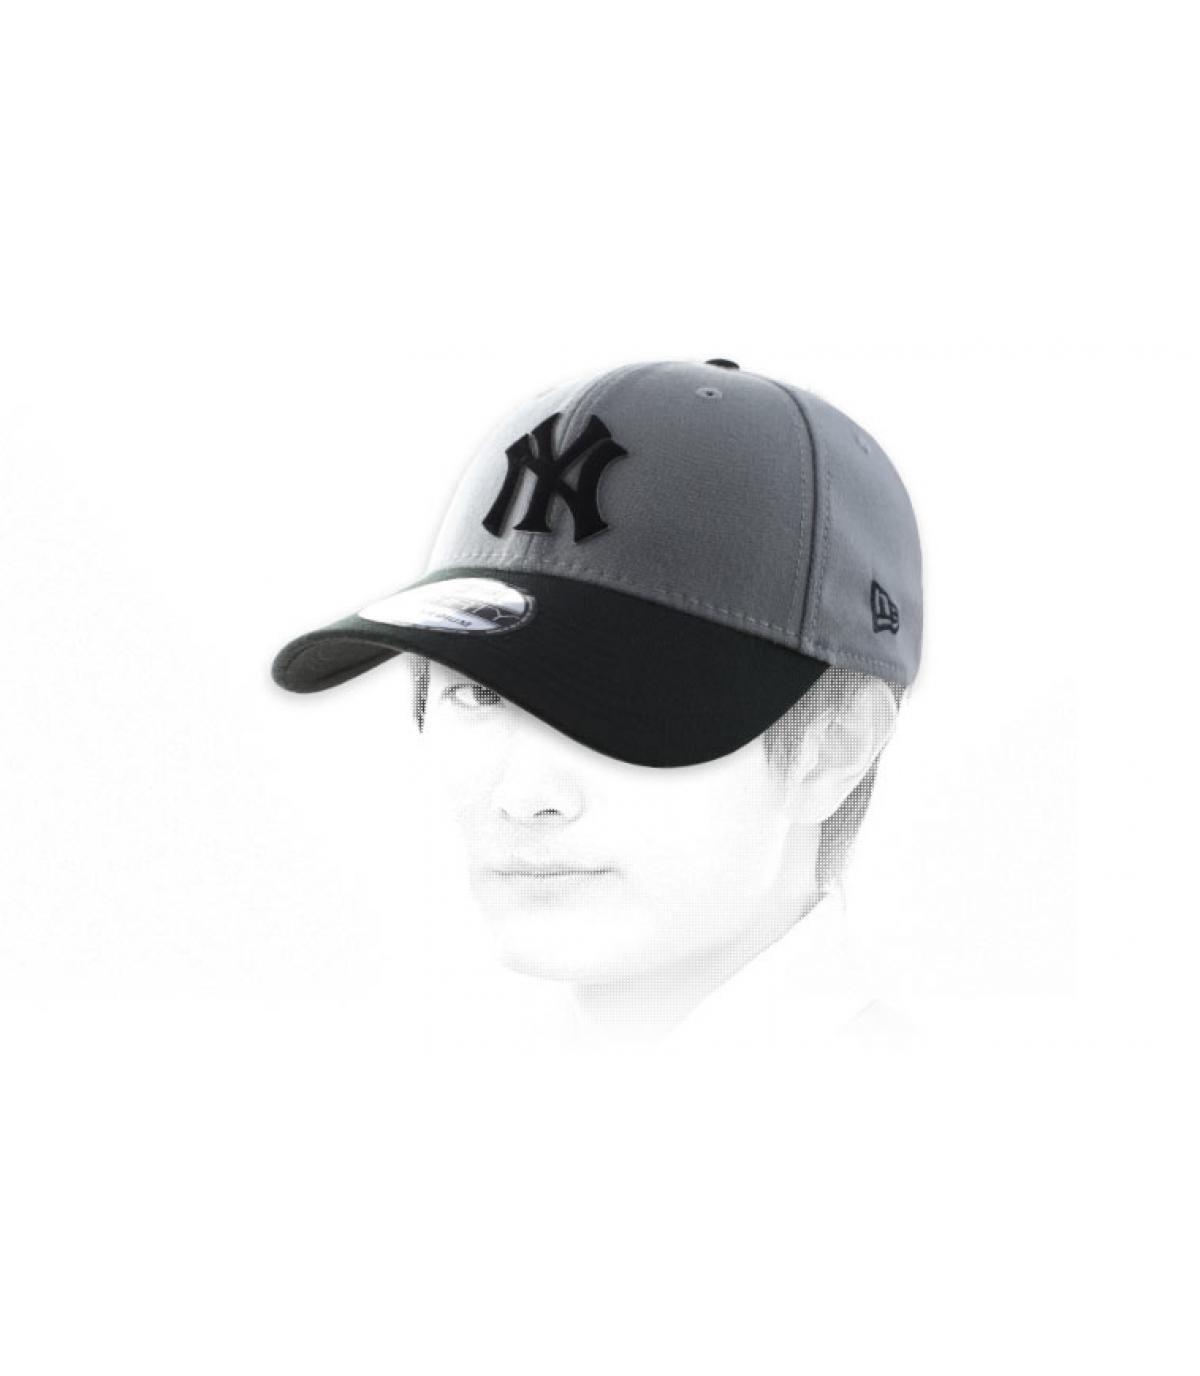 Cap NY grau schwarz